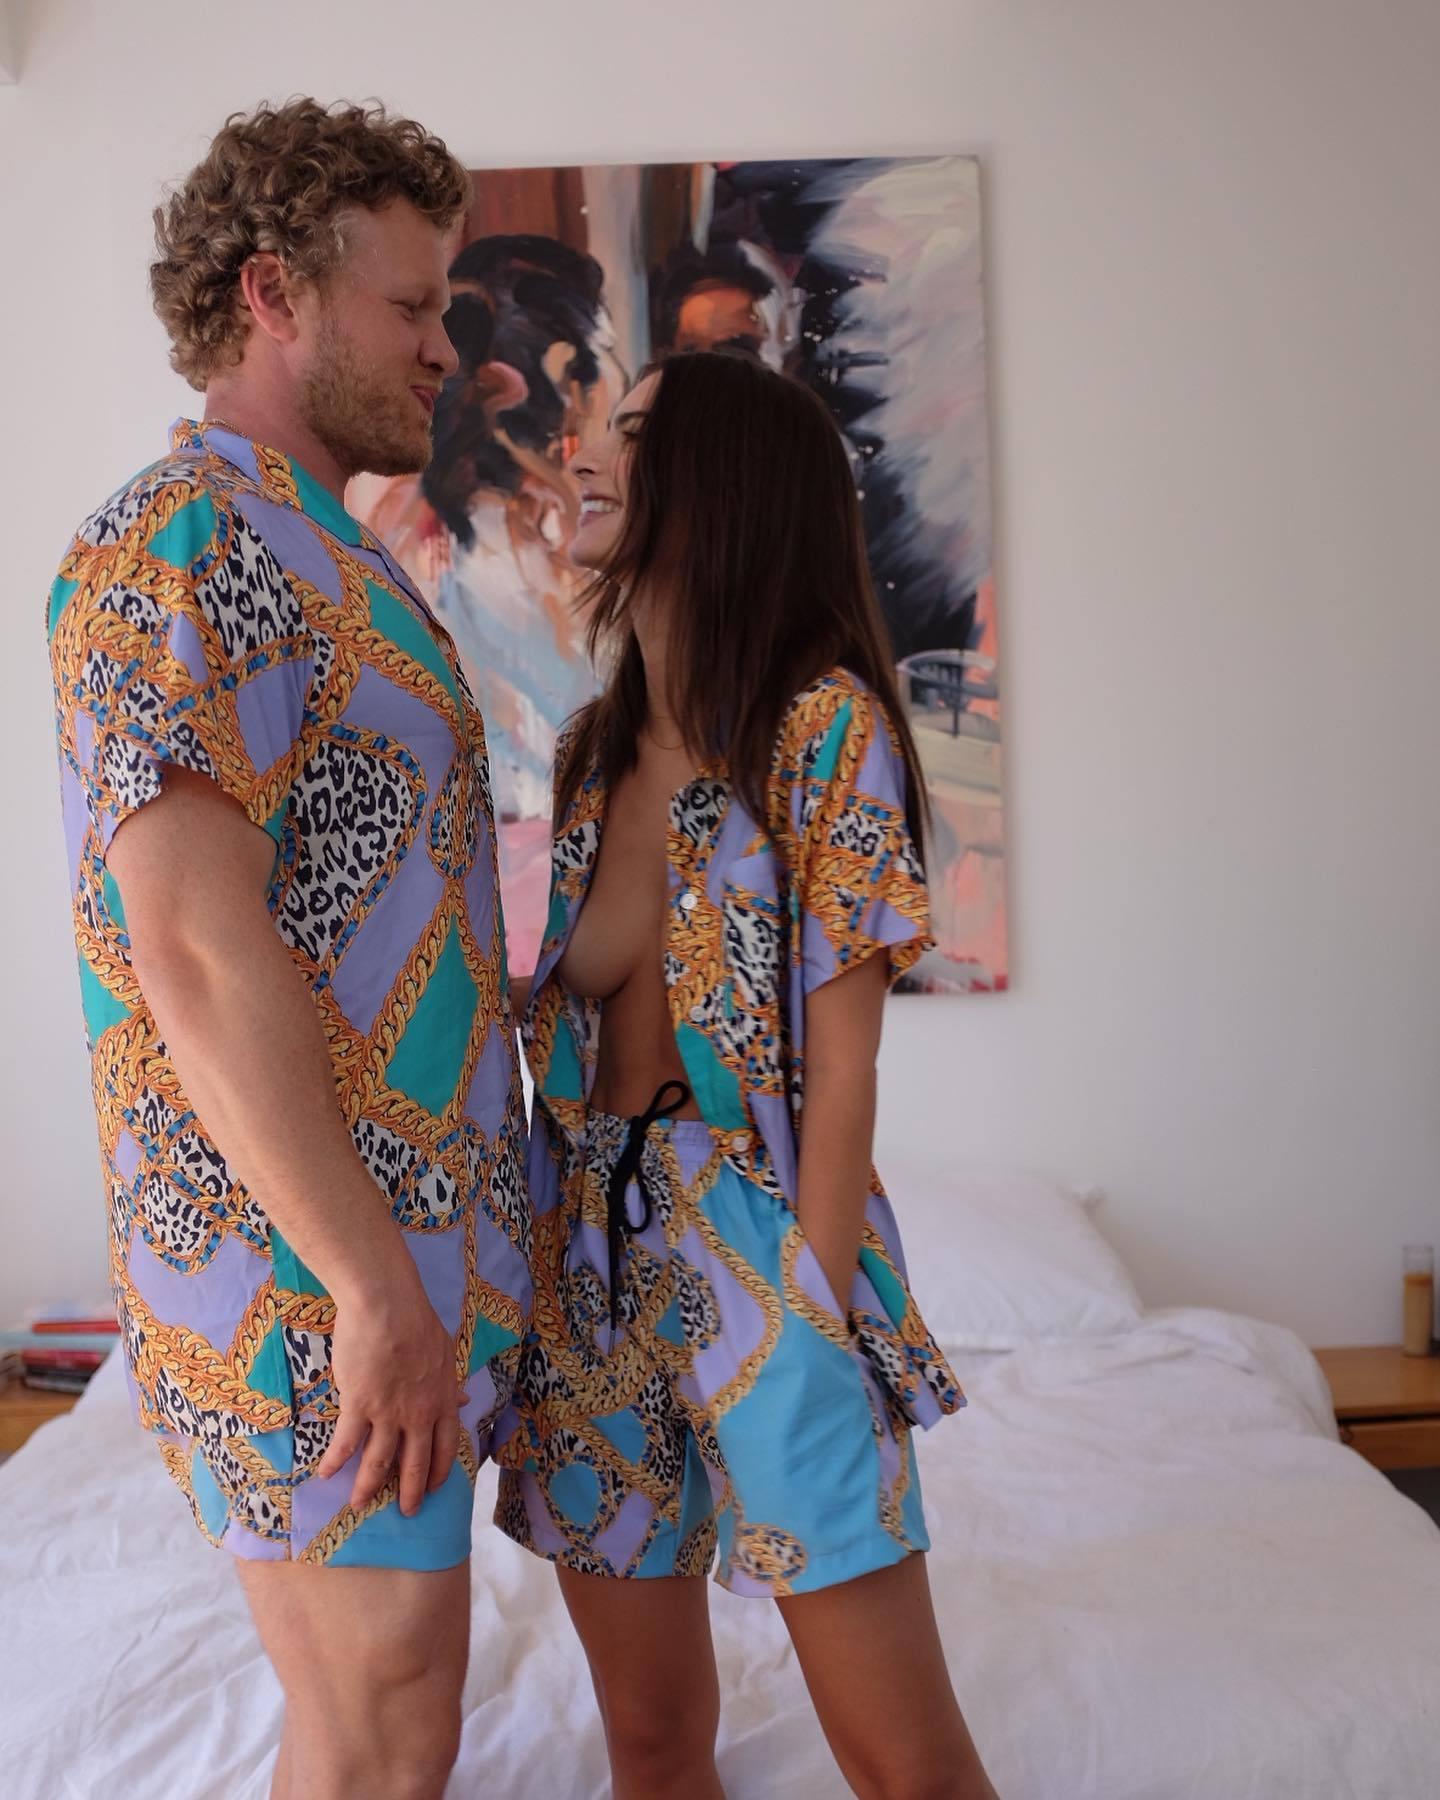 Emily Ratajkowski – Perfect Boobs In Sexy Braless Photoshoot For Inamorata Collection 0005